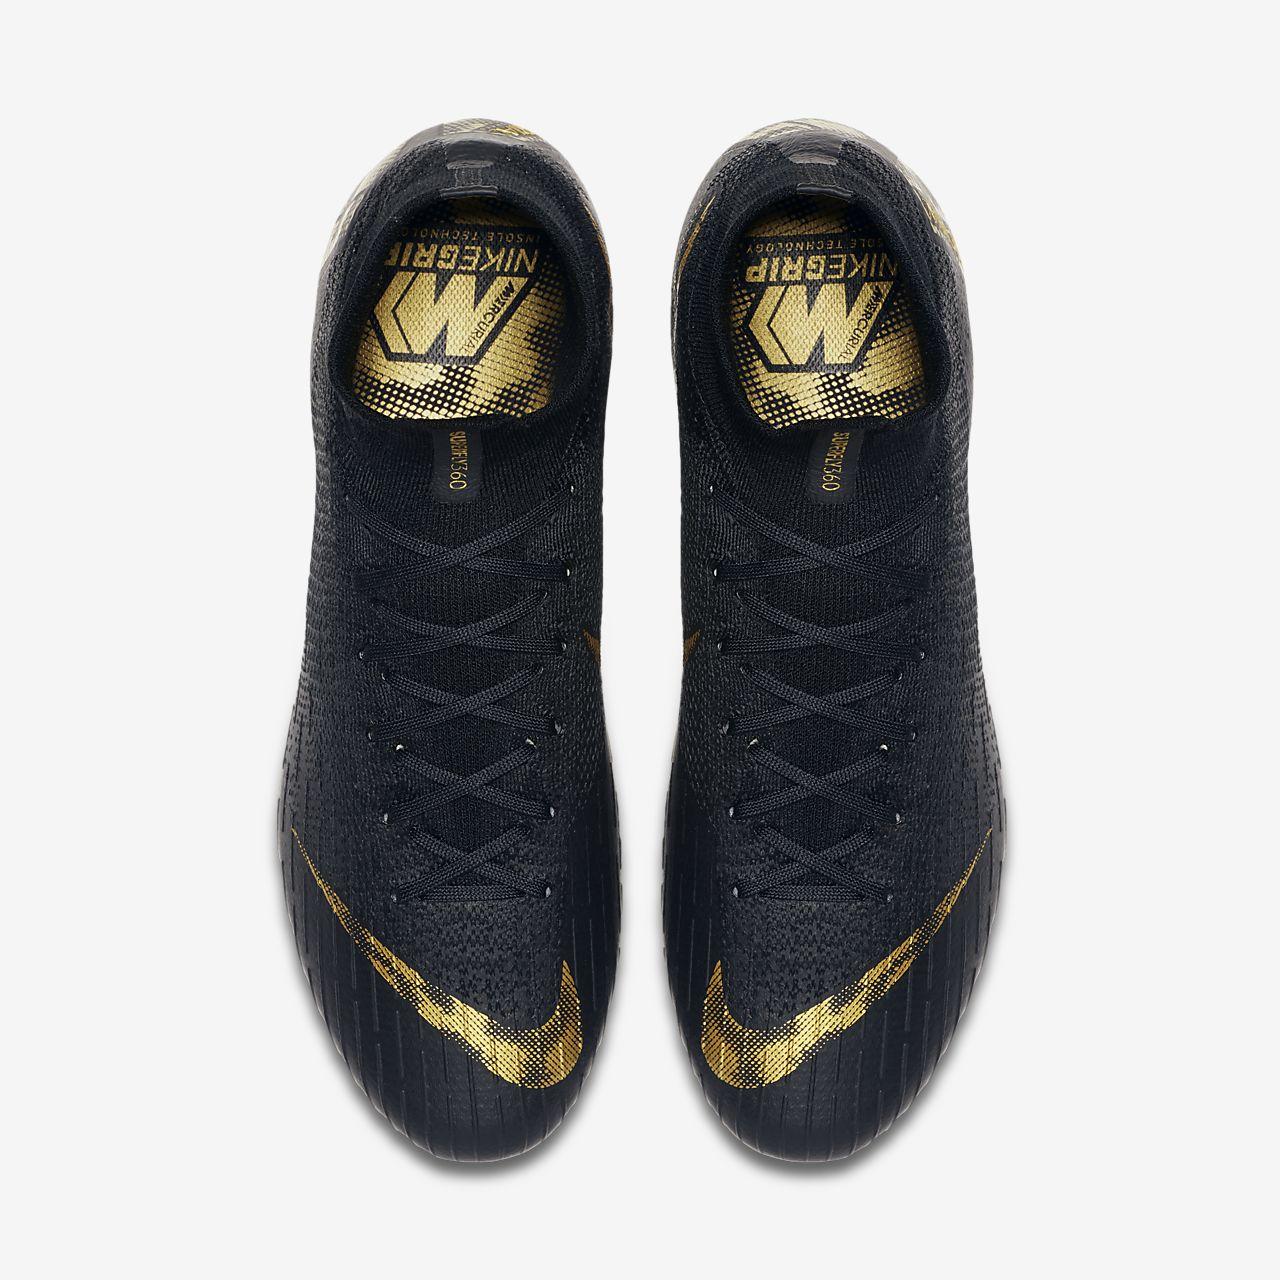 0b2e8ae4e7ae1 ... Chuteiras de futebol para terreno mole Nike Mercurial Superfly 360  Elite SG-PRO Anti-